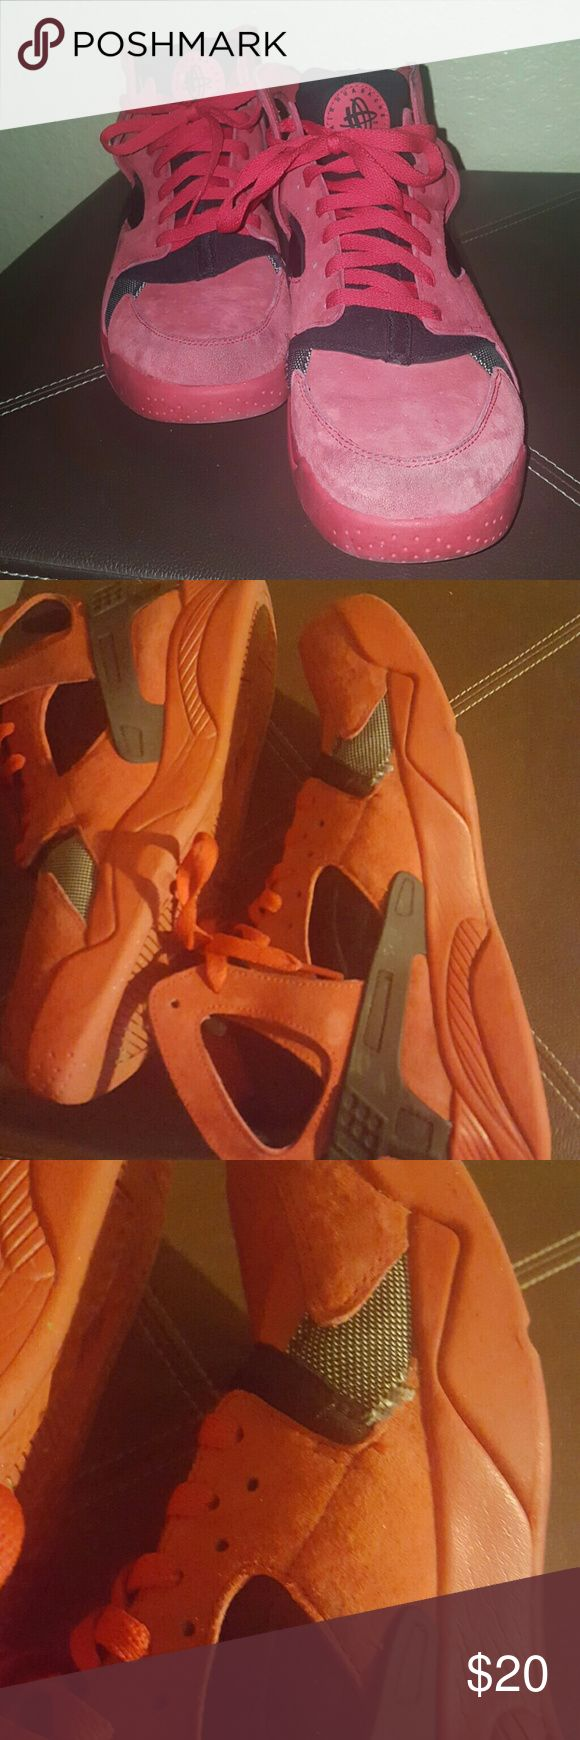 Huarache Air Flights High top Nike Huarache Nike Shoes Sneakers